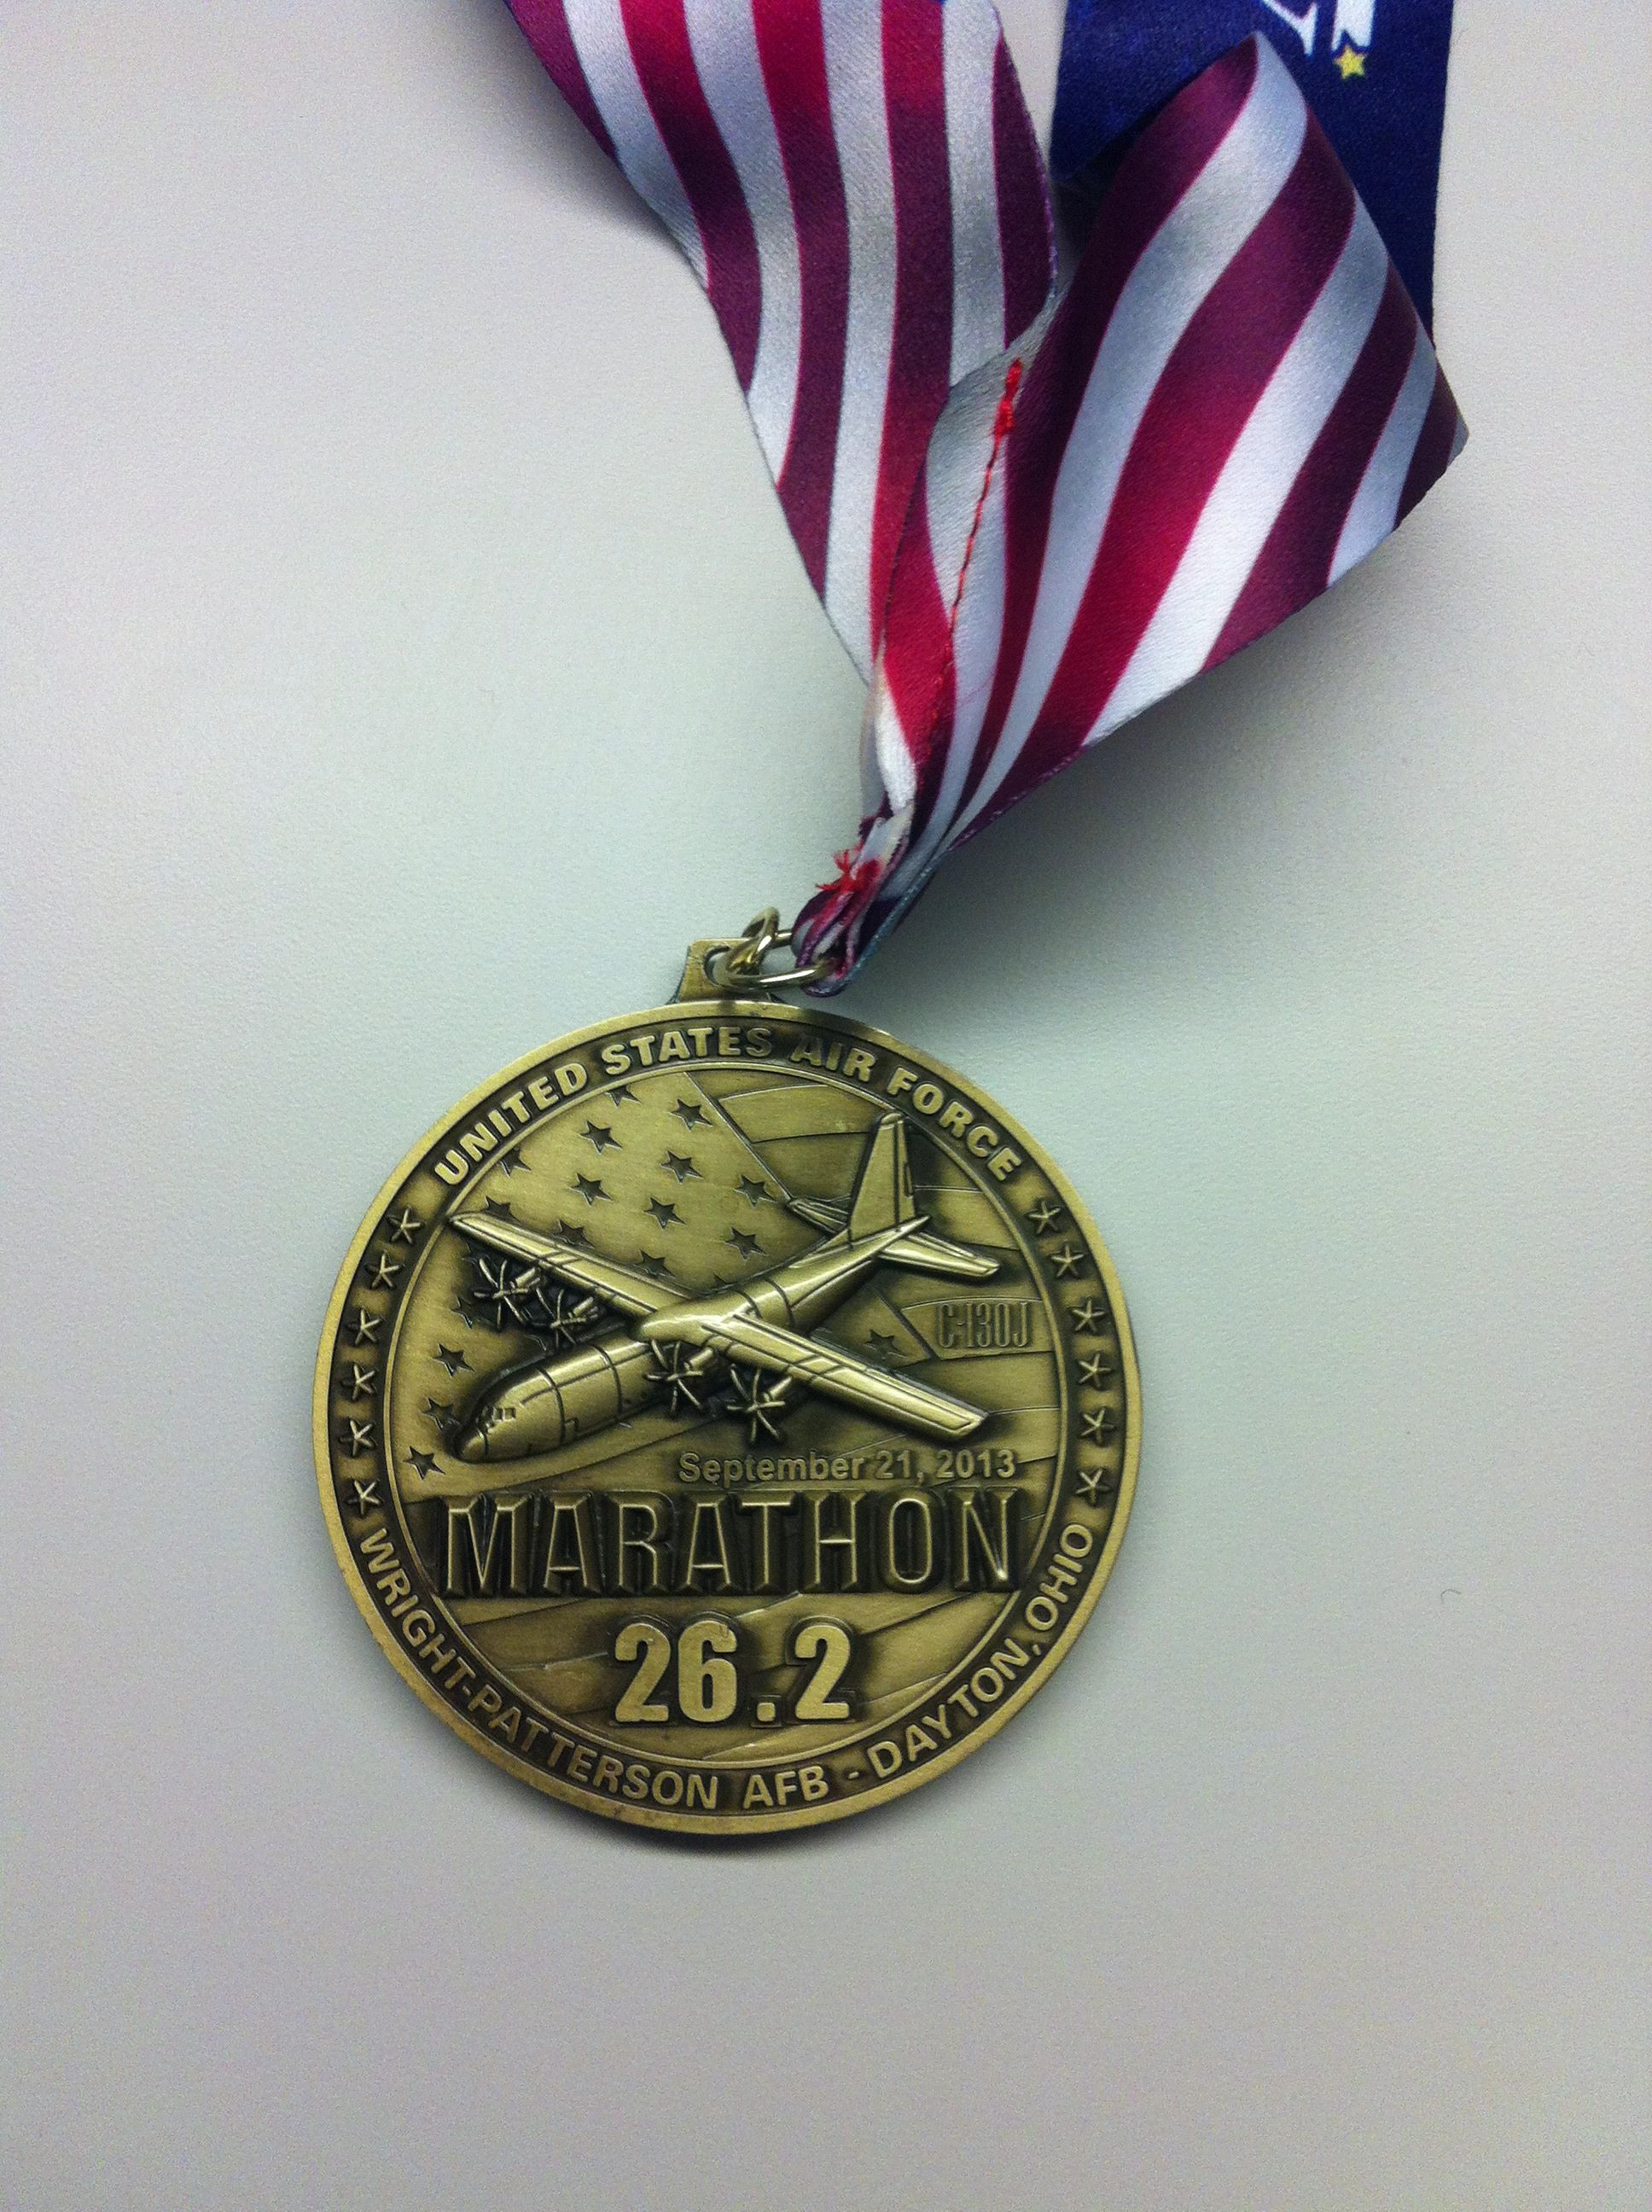 The 2013 Air Force Marathon full marathon medal